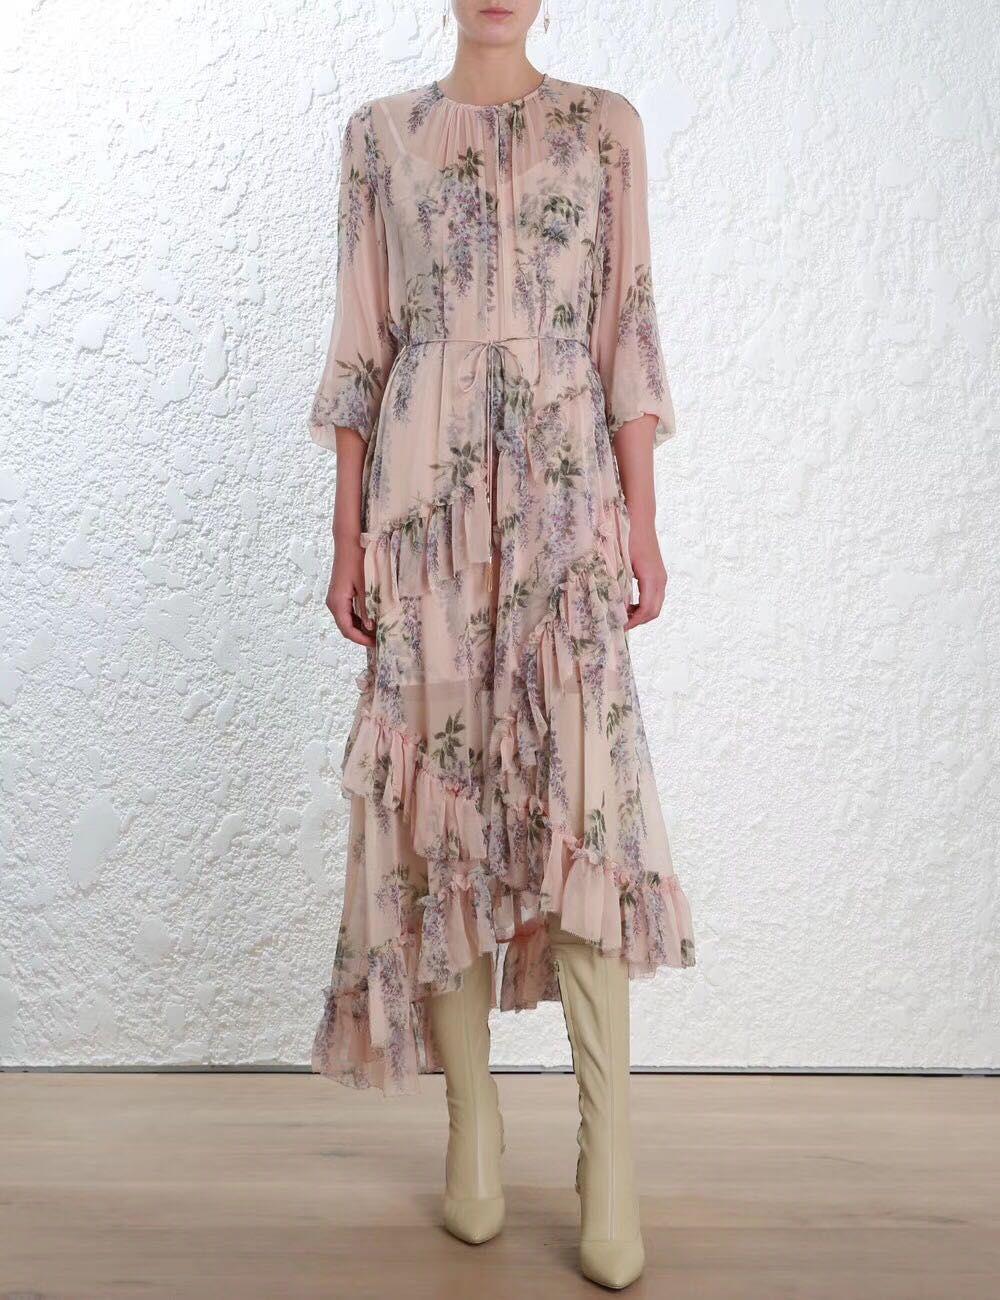 Women Floral Silk Georgette Folly Feathery Dress Ruffles Asymmetric Sheer Midi Dress